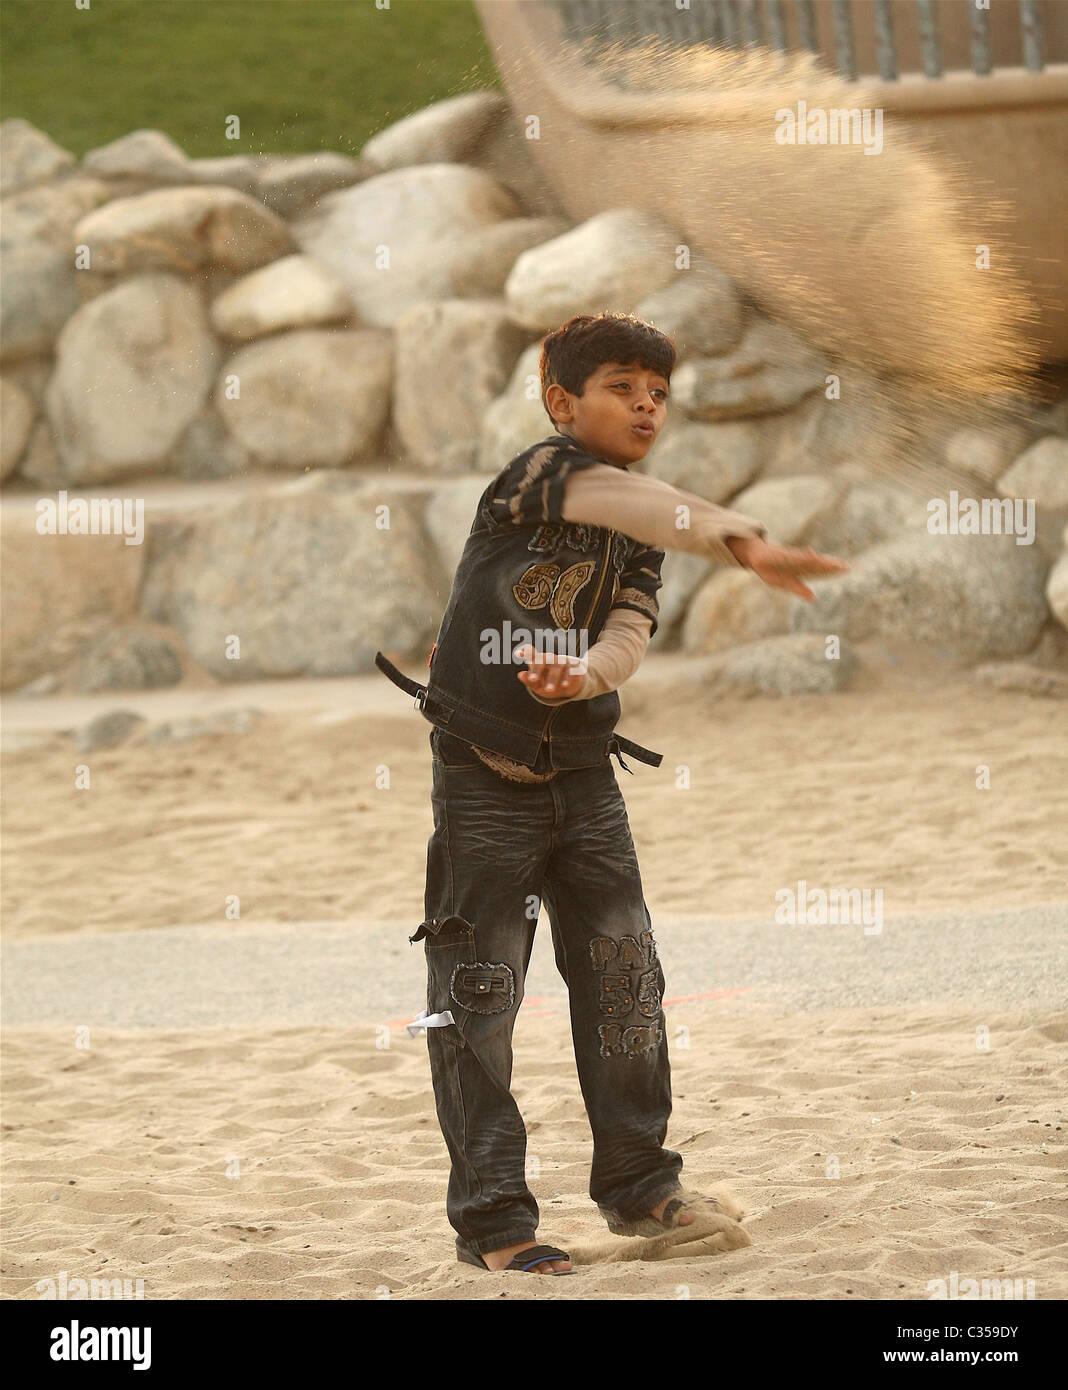 Azharuddin Mohammed Ismail Director and cast of 'Slumdog Millionaire' visit Santa Monica Pier Los Angles, California - 24.02.09 Stock Photo